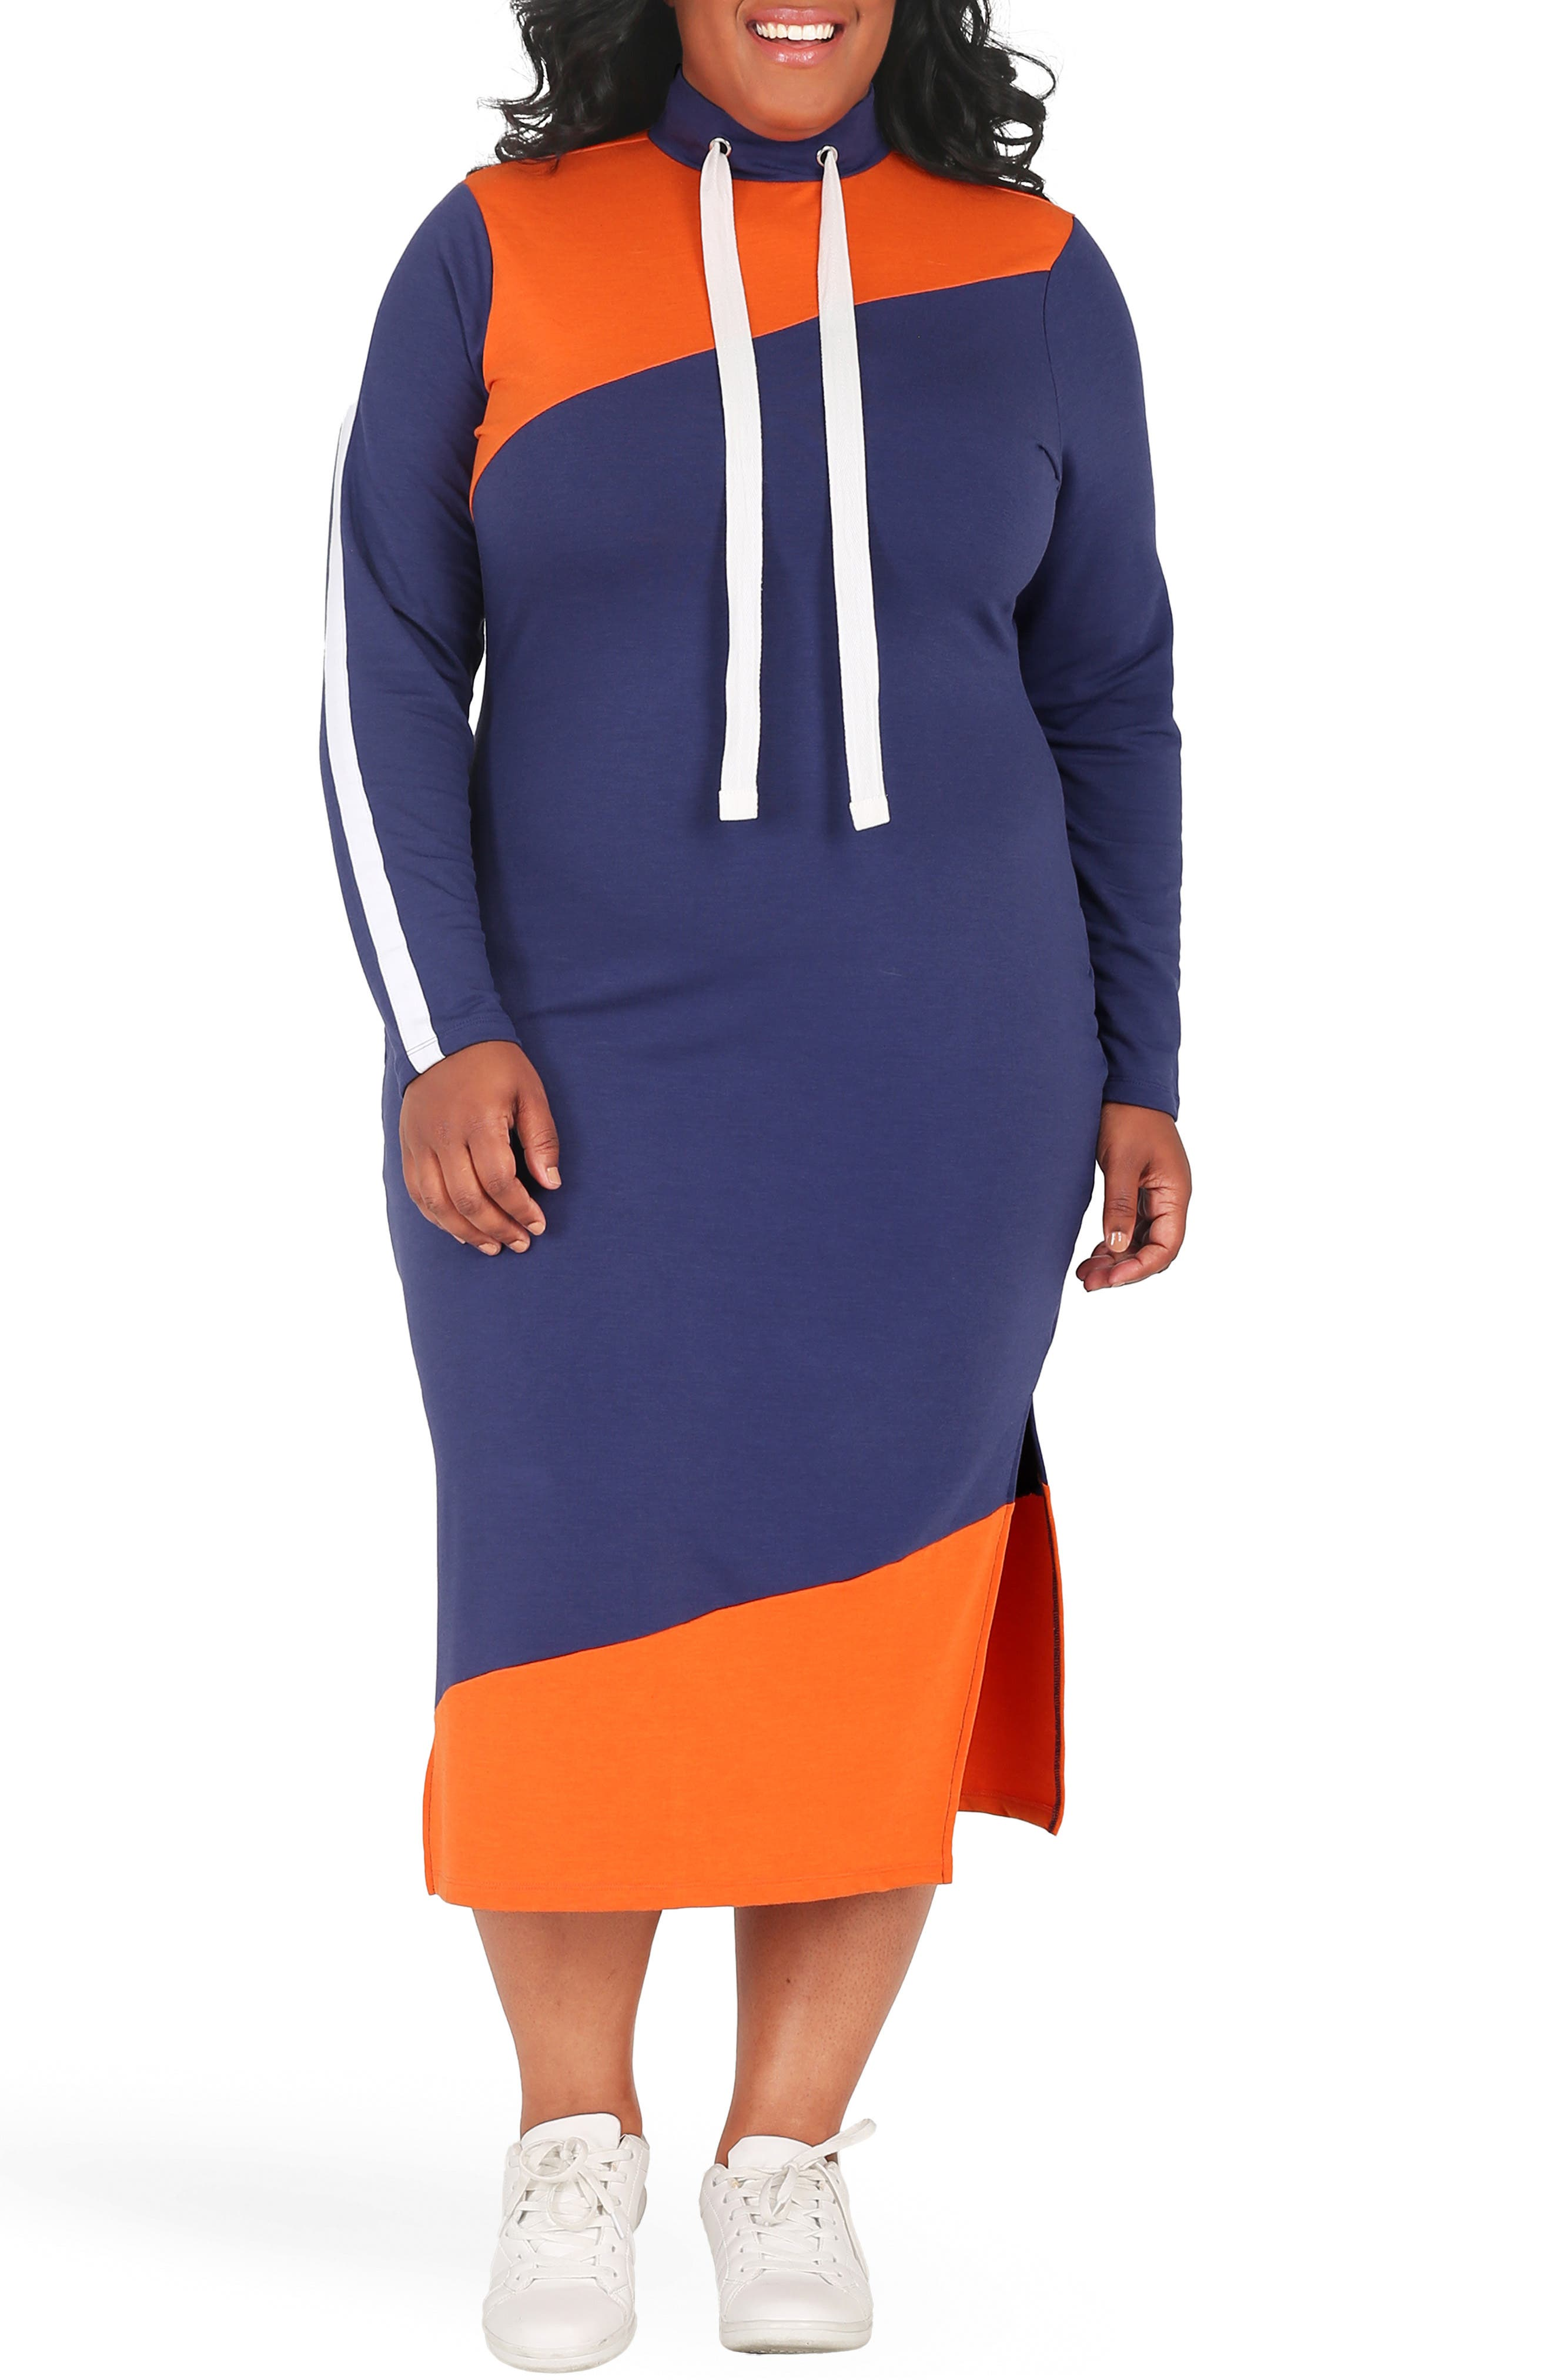 POETIC JUSTICE, Wanda Colorblock Midi Dress, Main thumbnail 1, color, NAVY